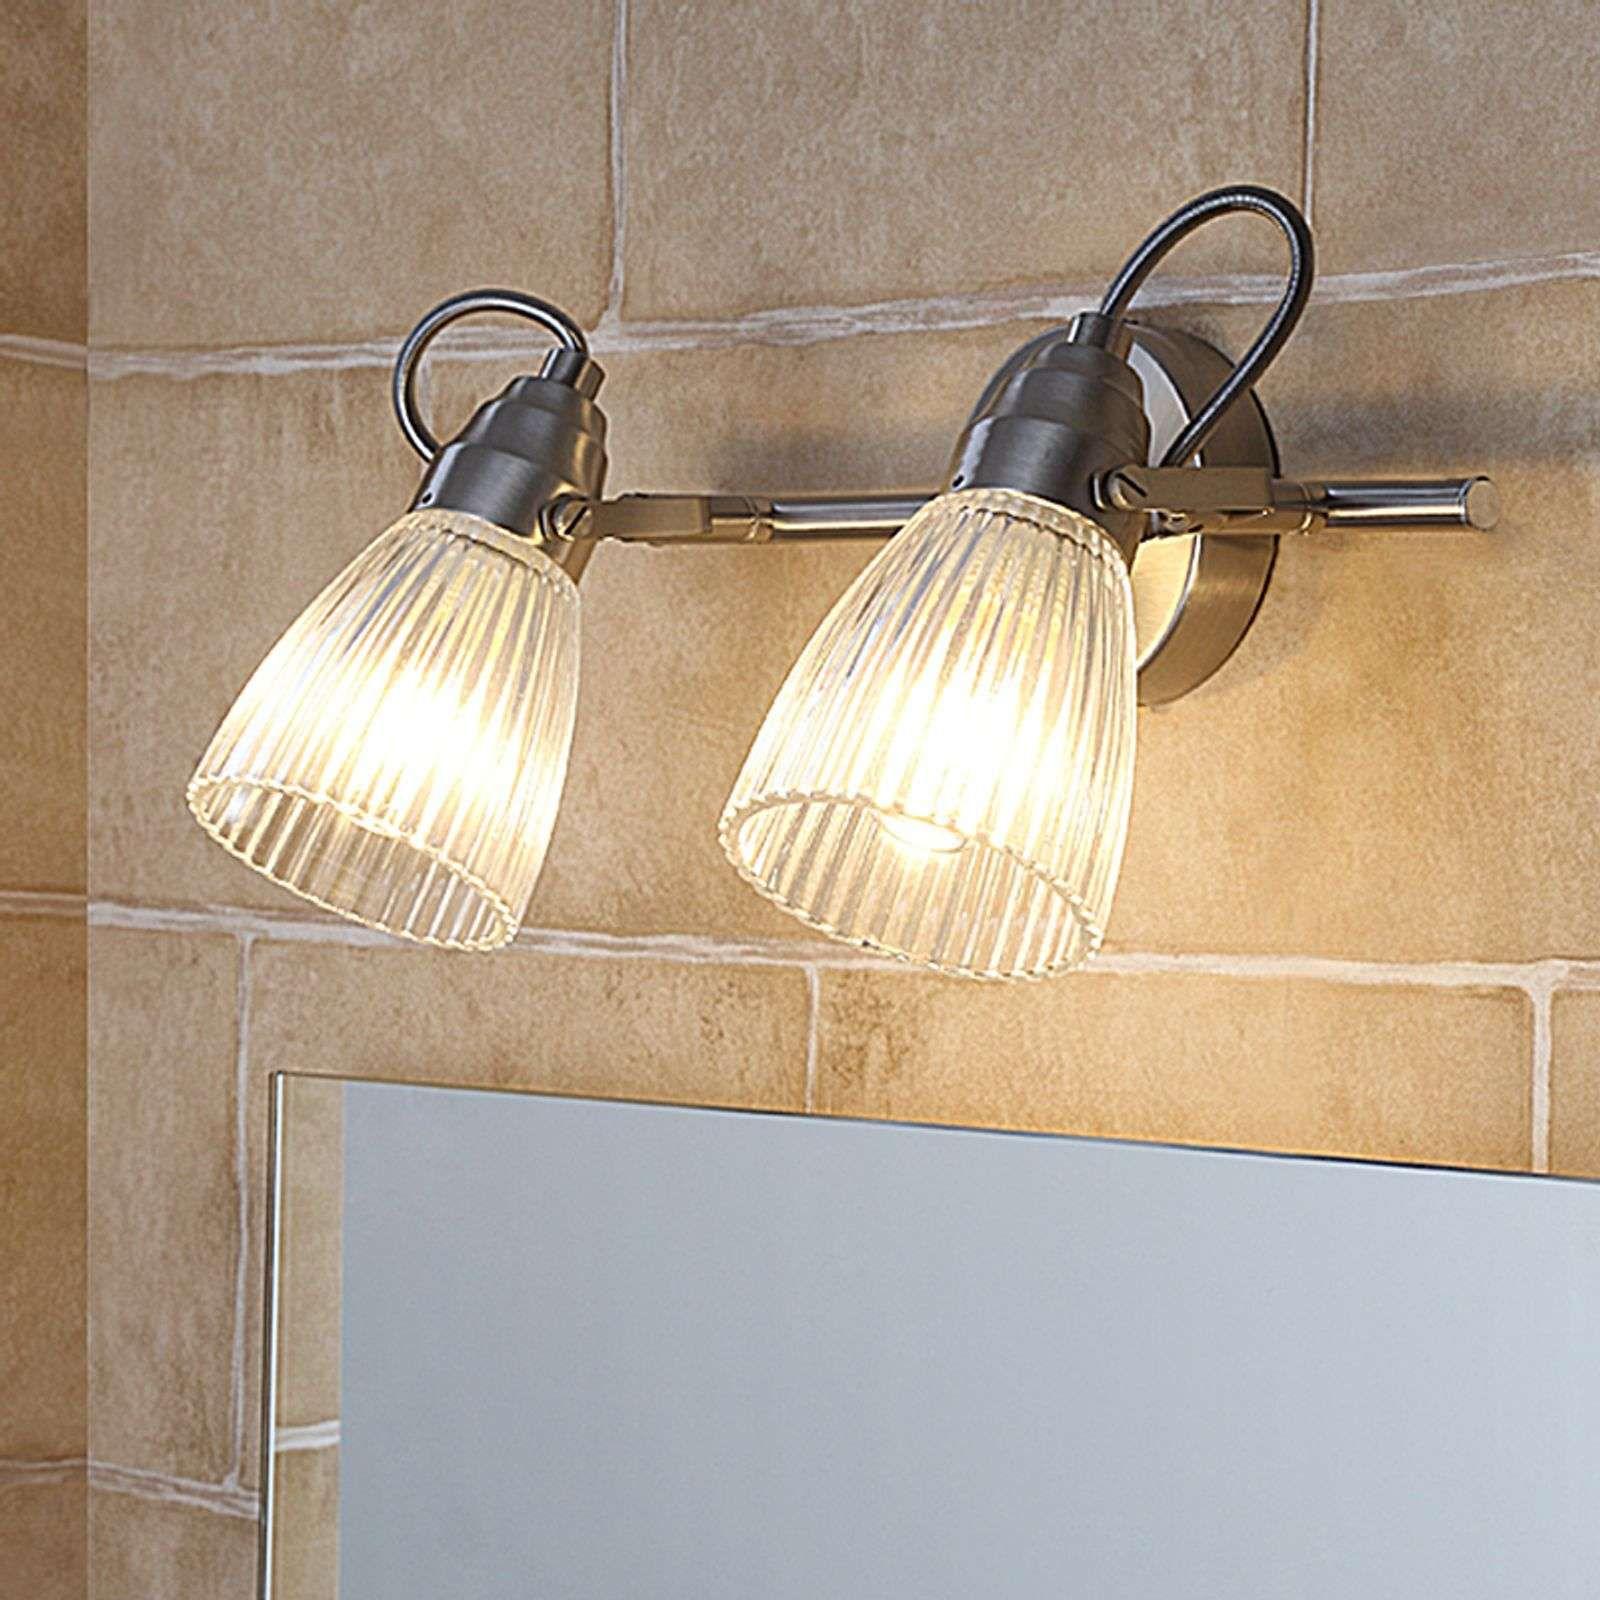 Wandleuchte Kuche Lampen Wandleuchten Wandlampe Mit Schalter Und Stecker Edelstahl Lampe Wandleuchten Bad Led Wandleuchte Led Spiegel Mit Beleuchtung